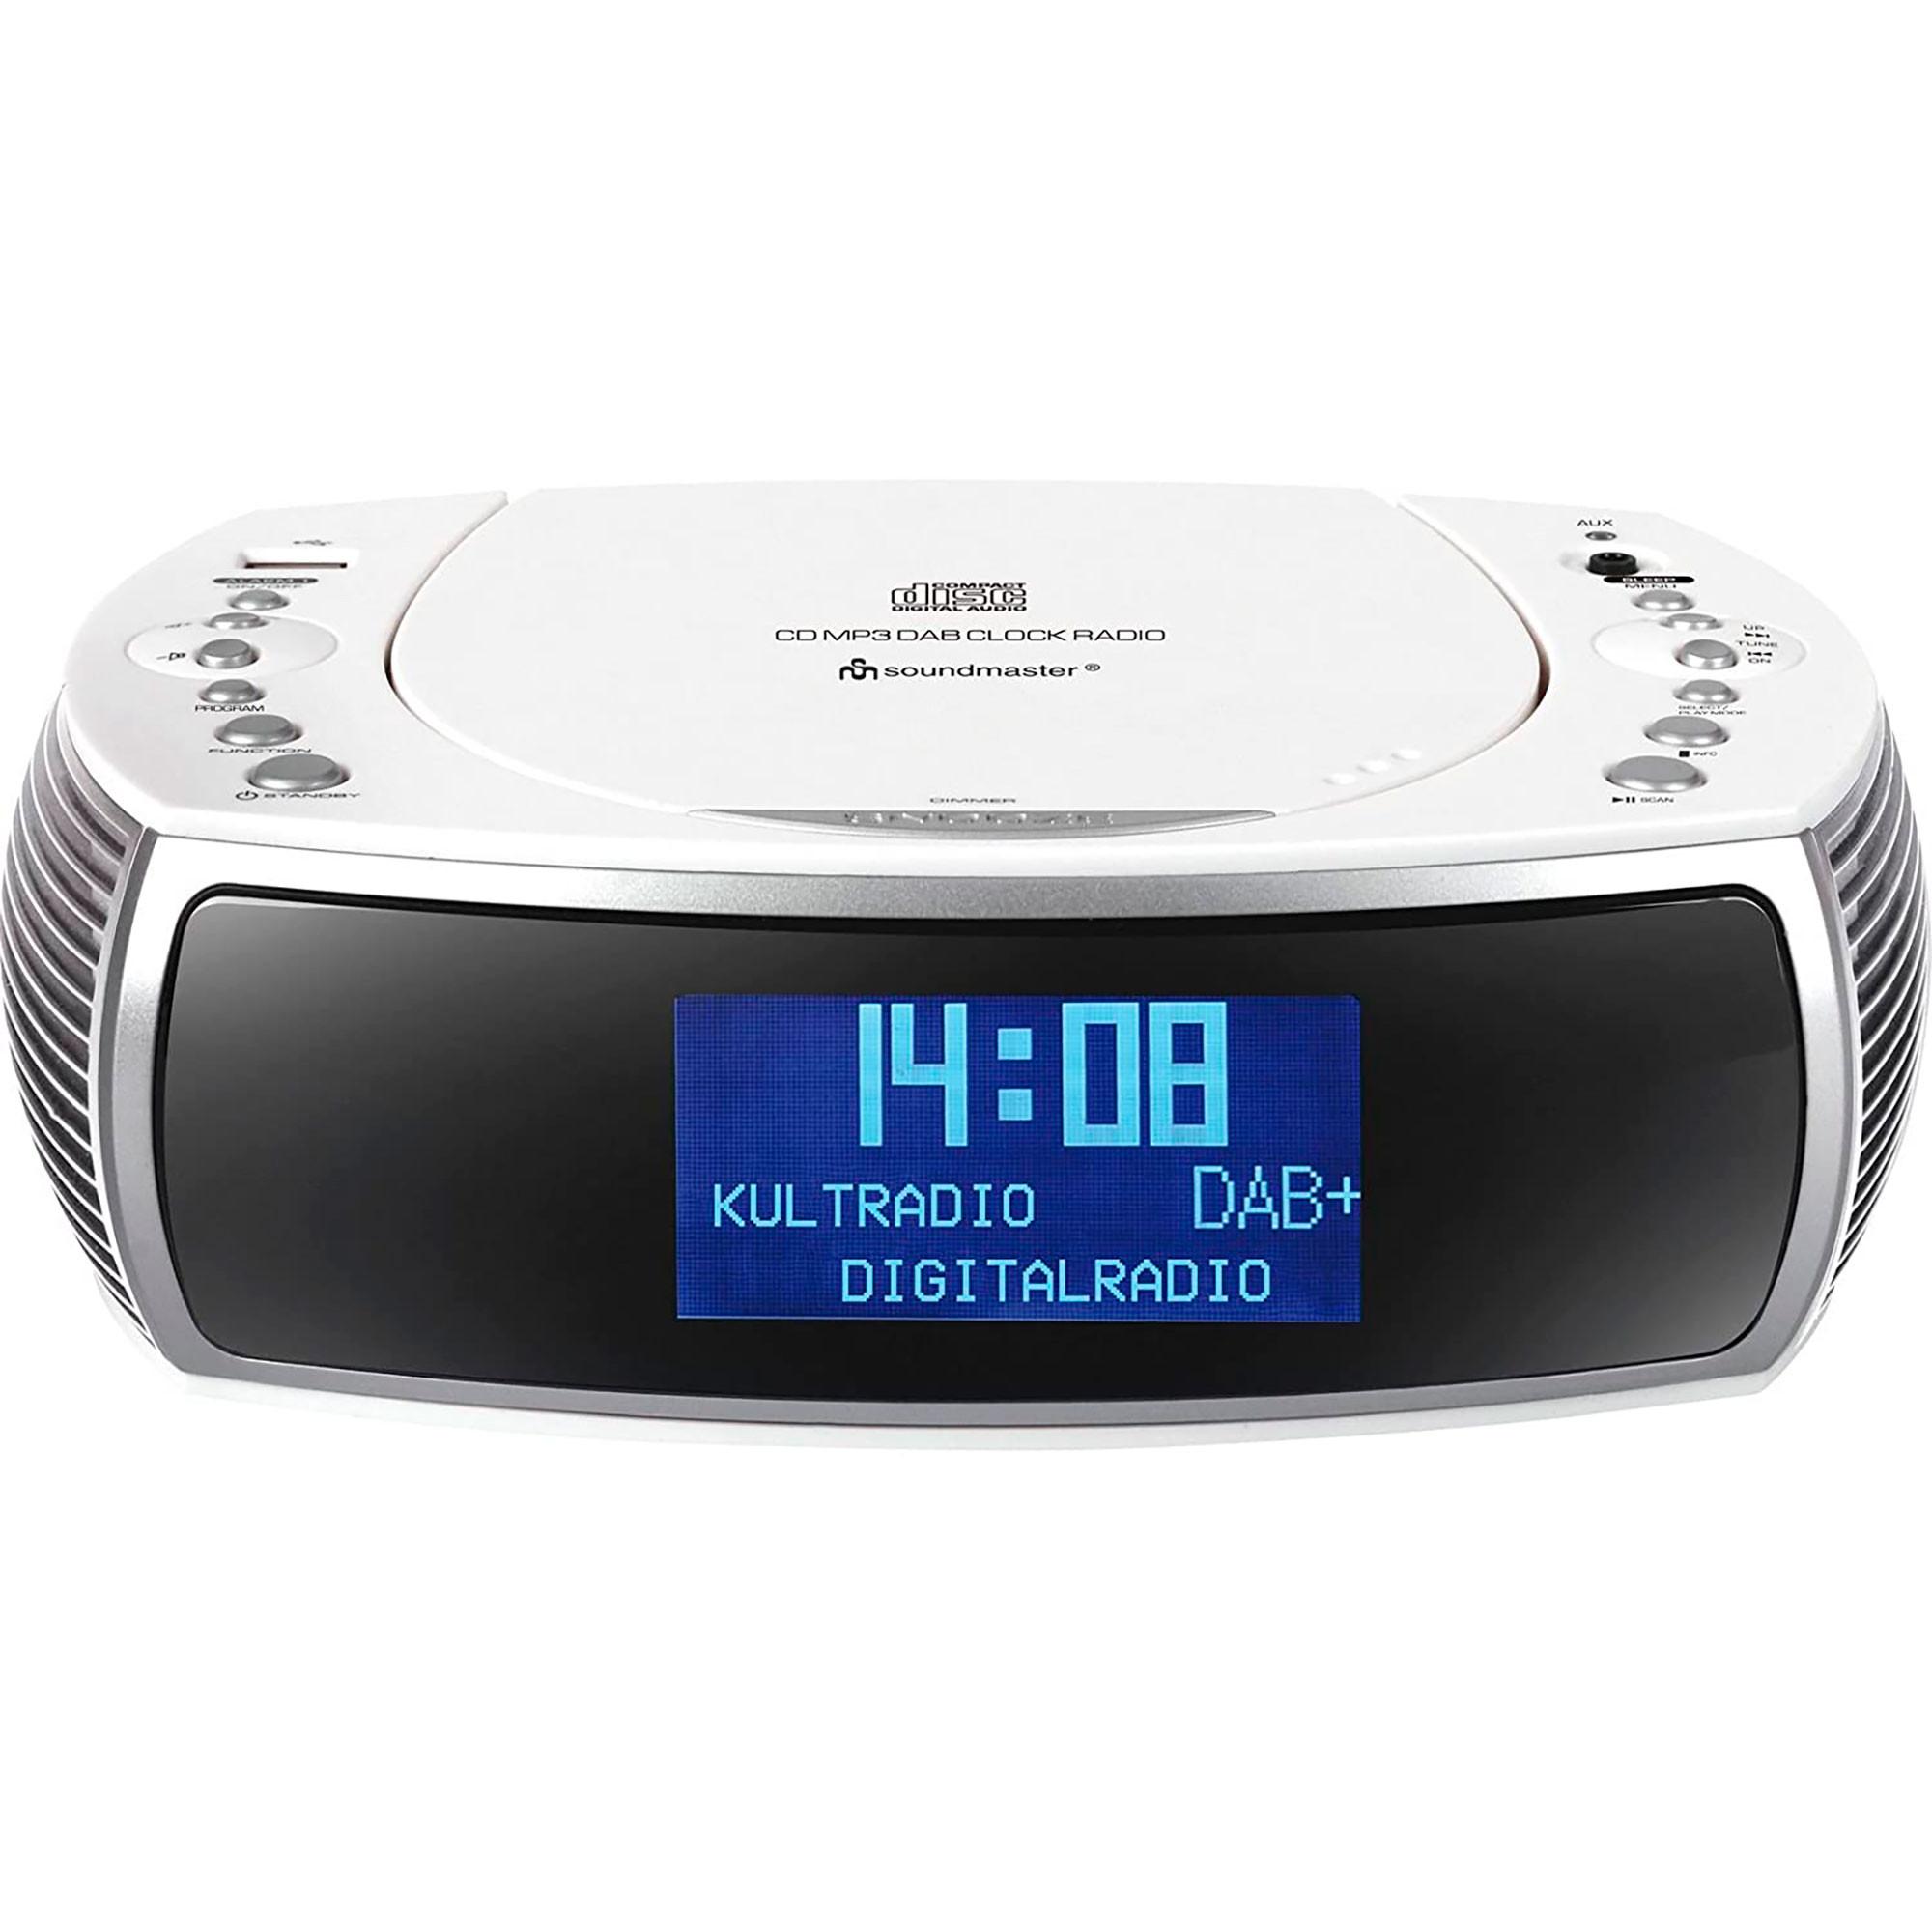 Soundmaster URD470WE Radio Despertador Portátil DAB/DAB +/FM, Reproductor CD-MP3, USB, AUX-IN, Sintonizador Pll, Blanco